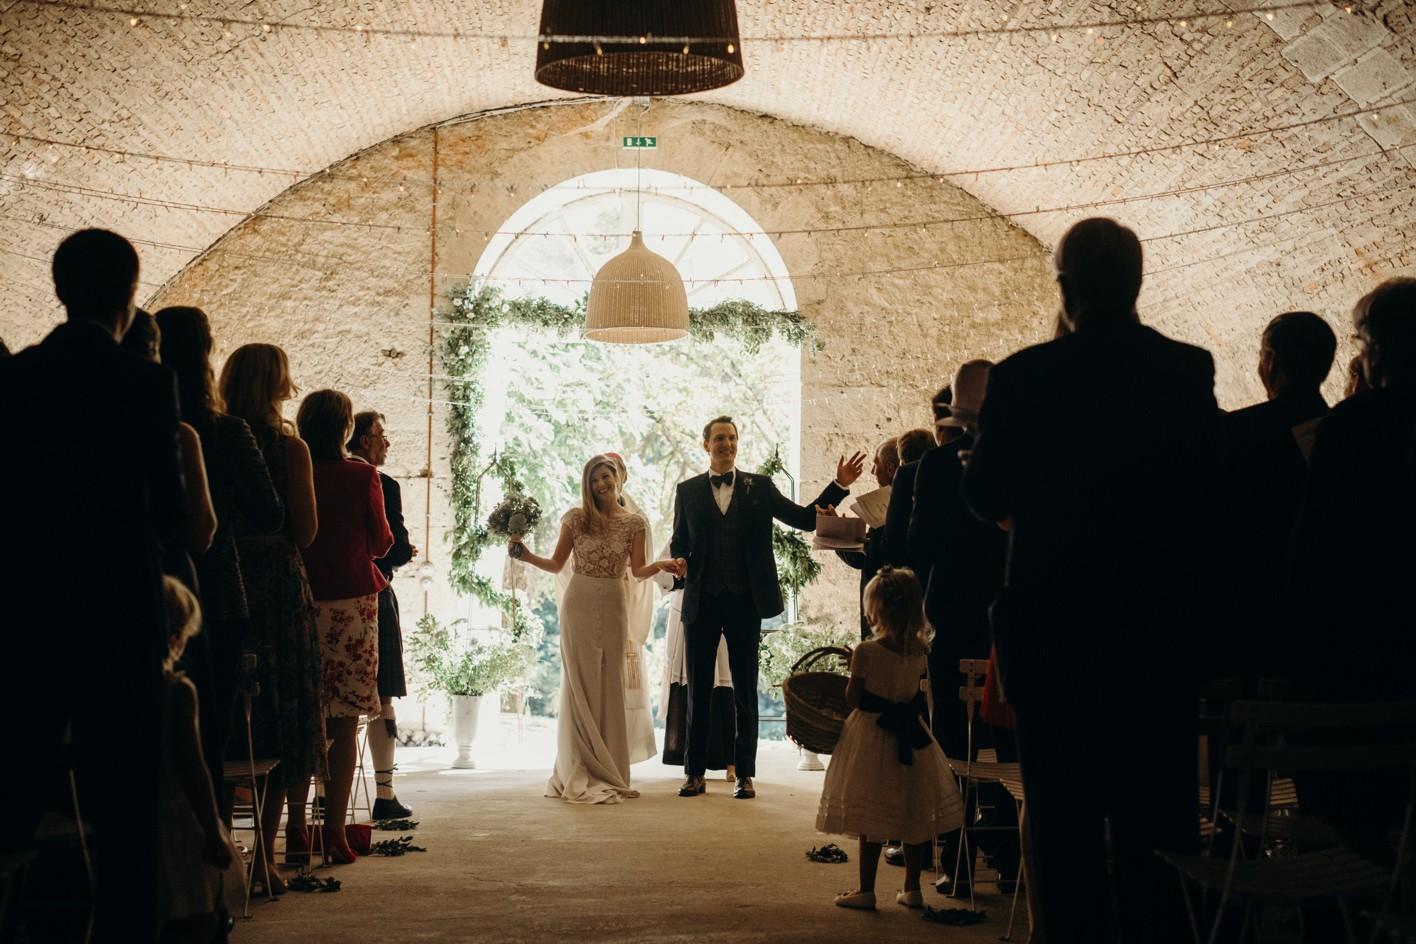 Chateau de lartigolle wedding near toulouse 053